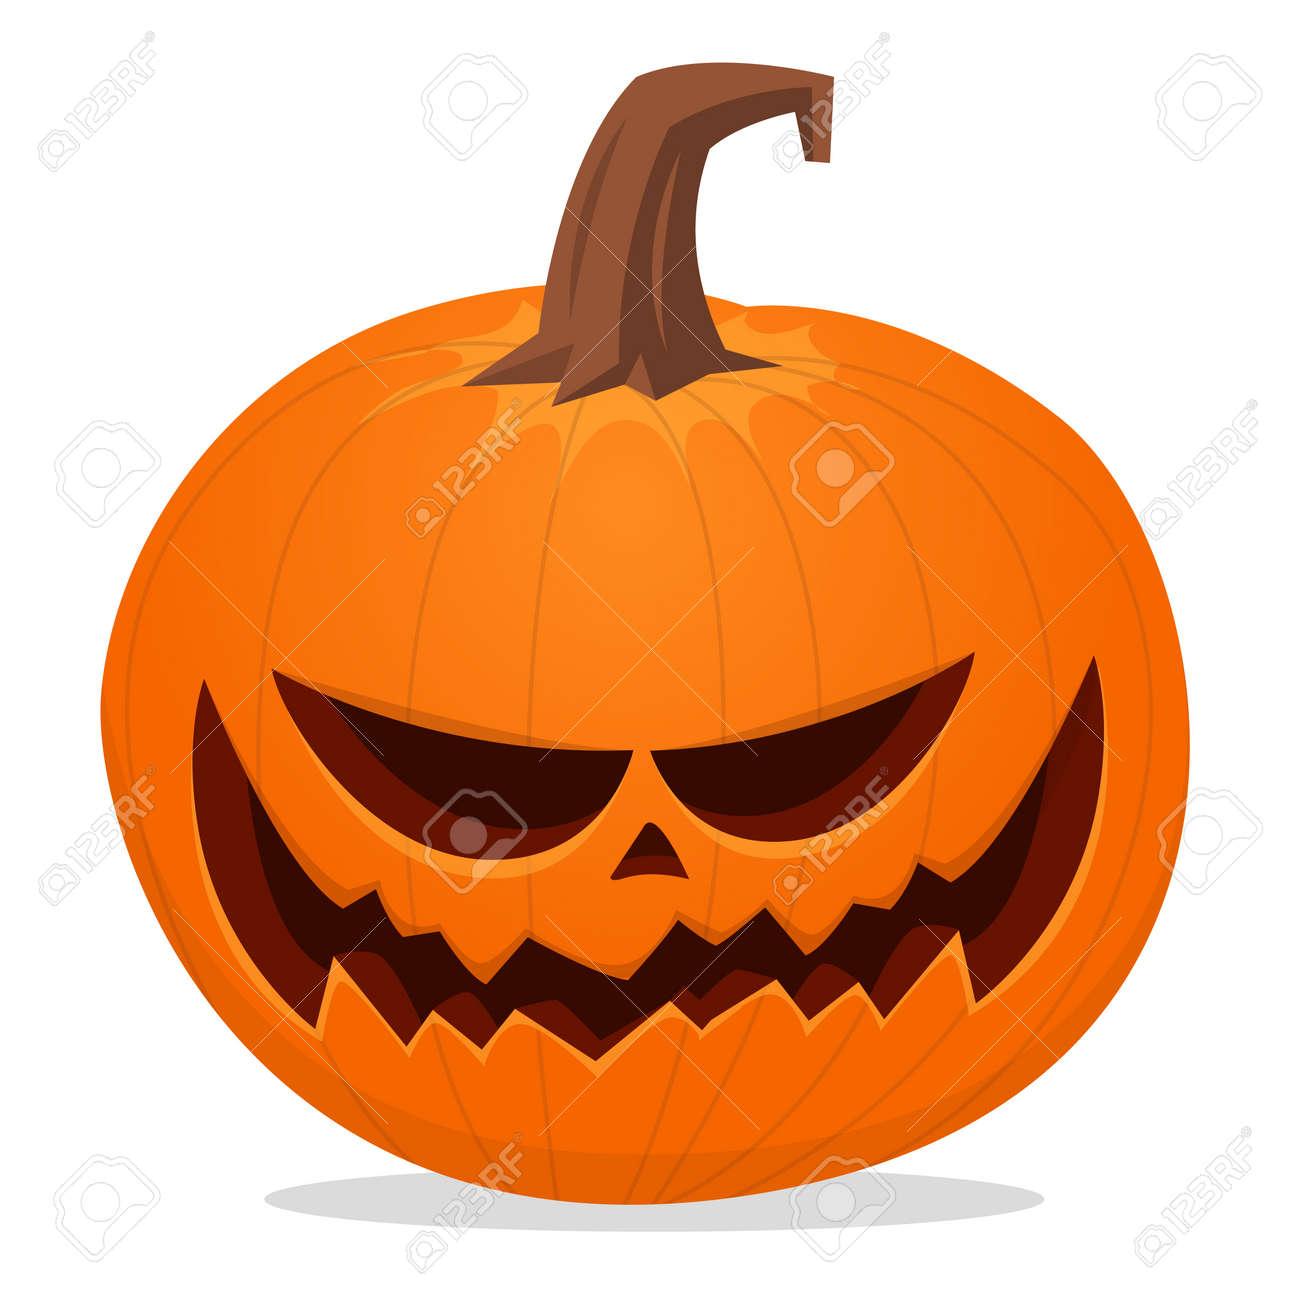 Halloween scarecrow with pumpkin head illustration. Vector cartoon carved jack-o-lantern isolated - 155387982